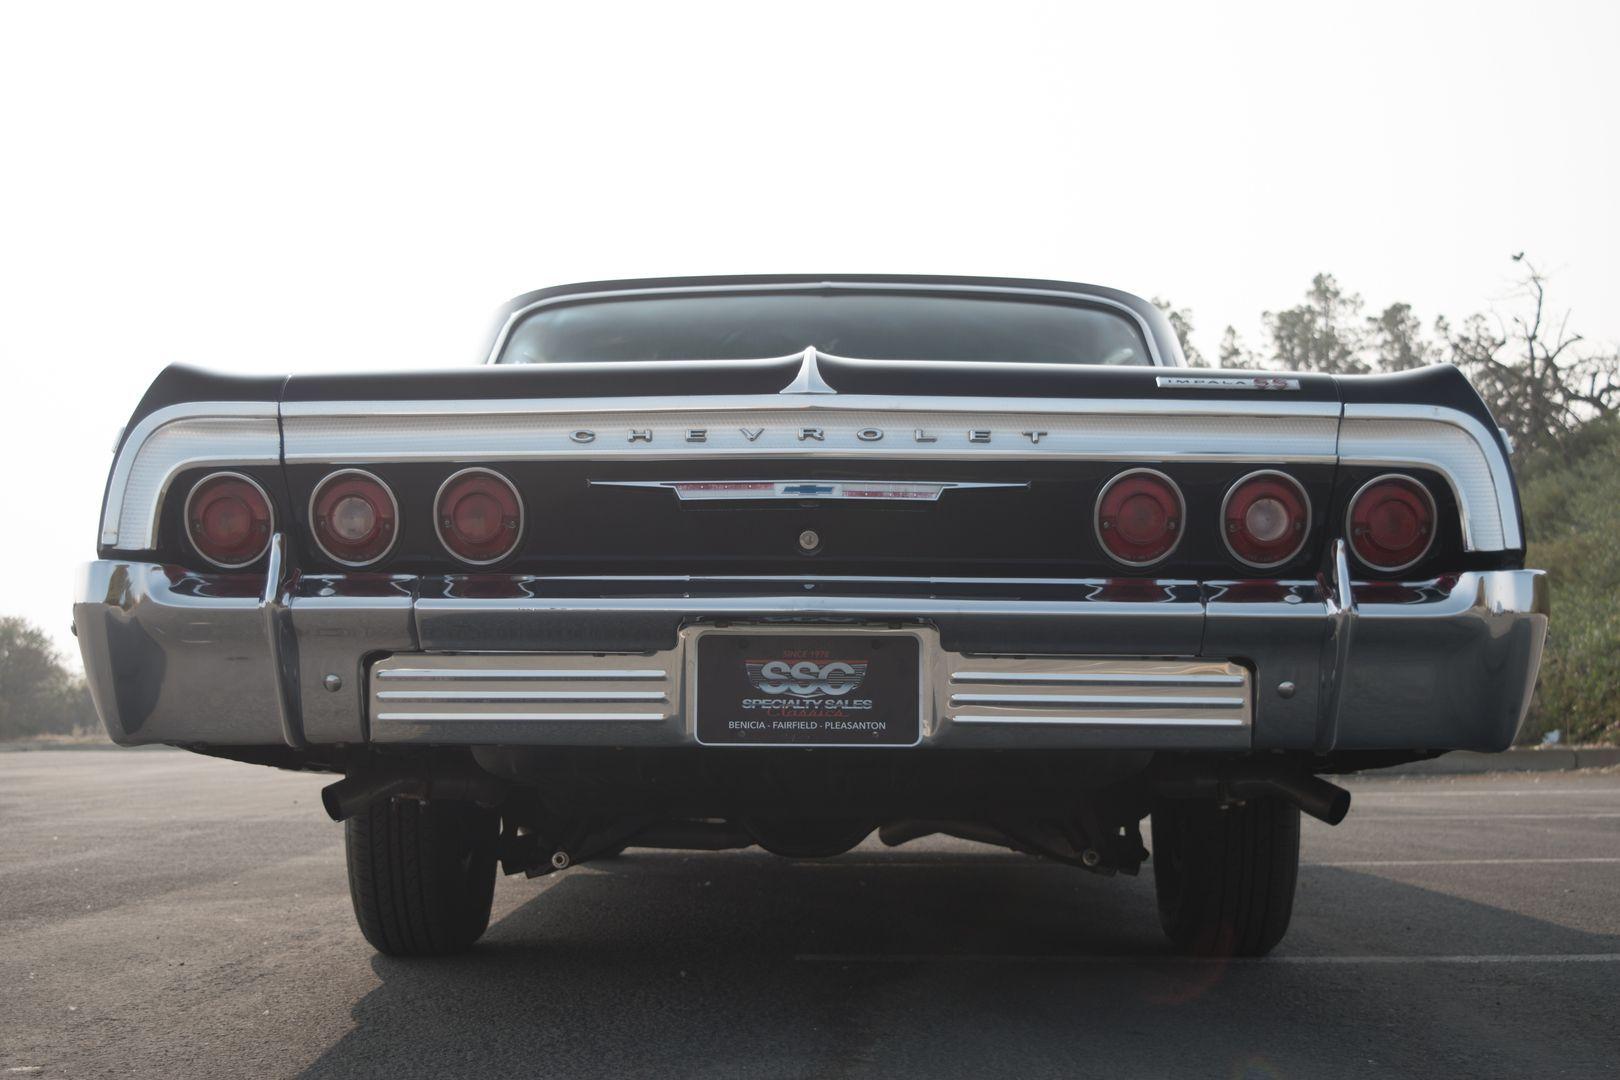 1964 Chevrolet Impala 14 Impala Chevrolet Impala Chevrolet